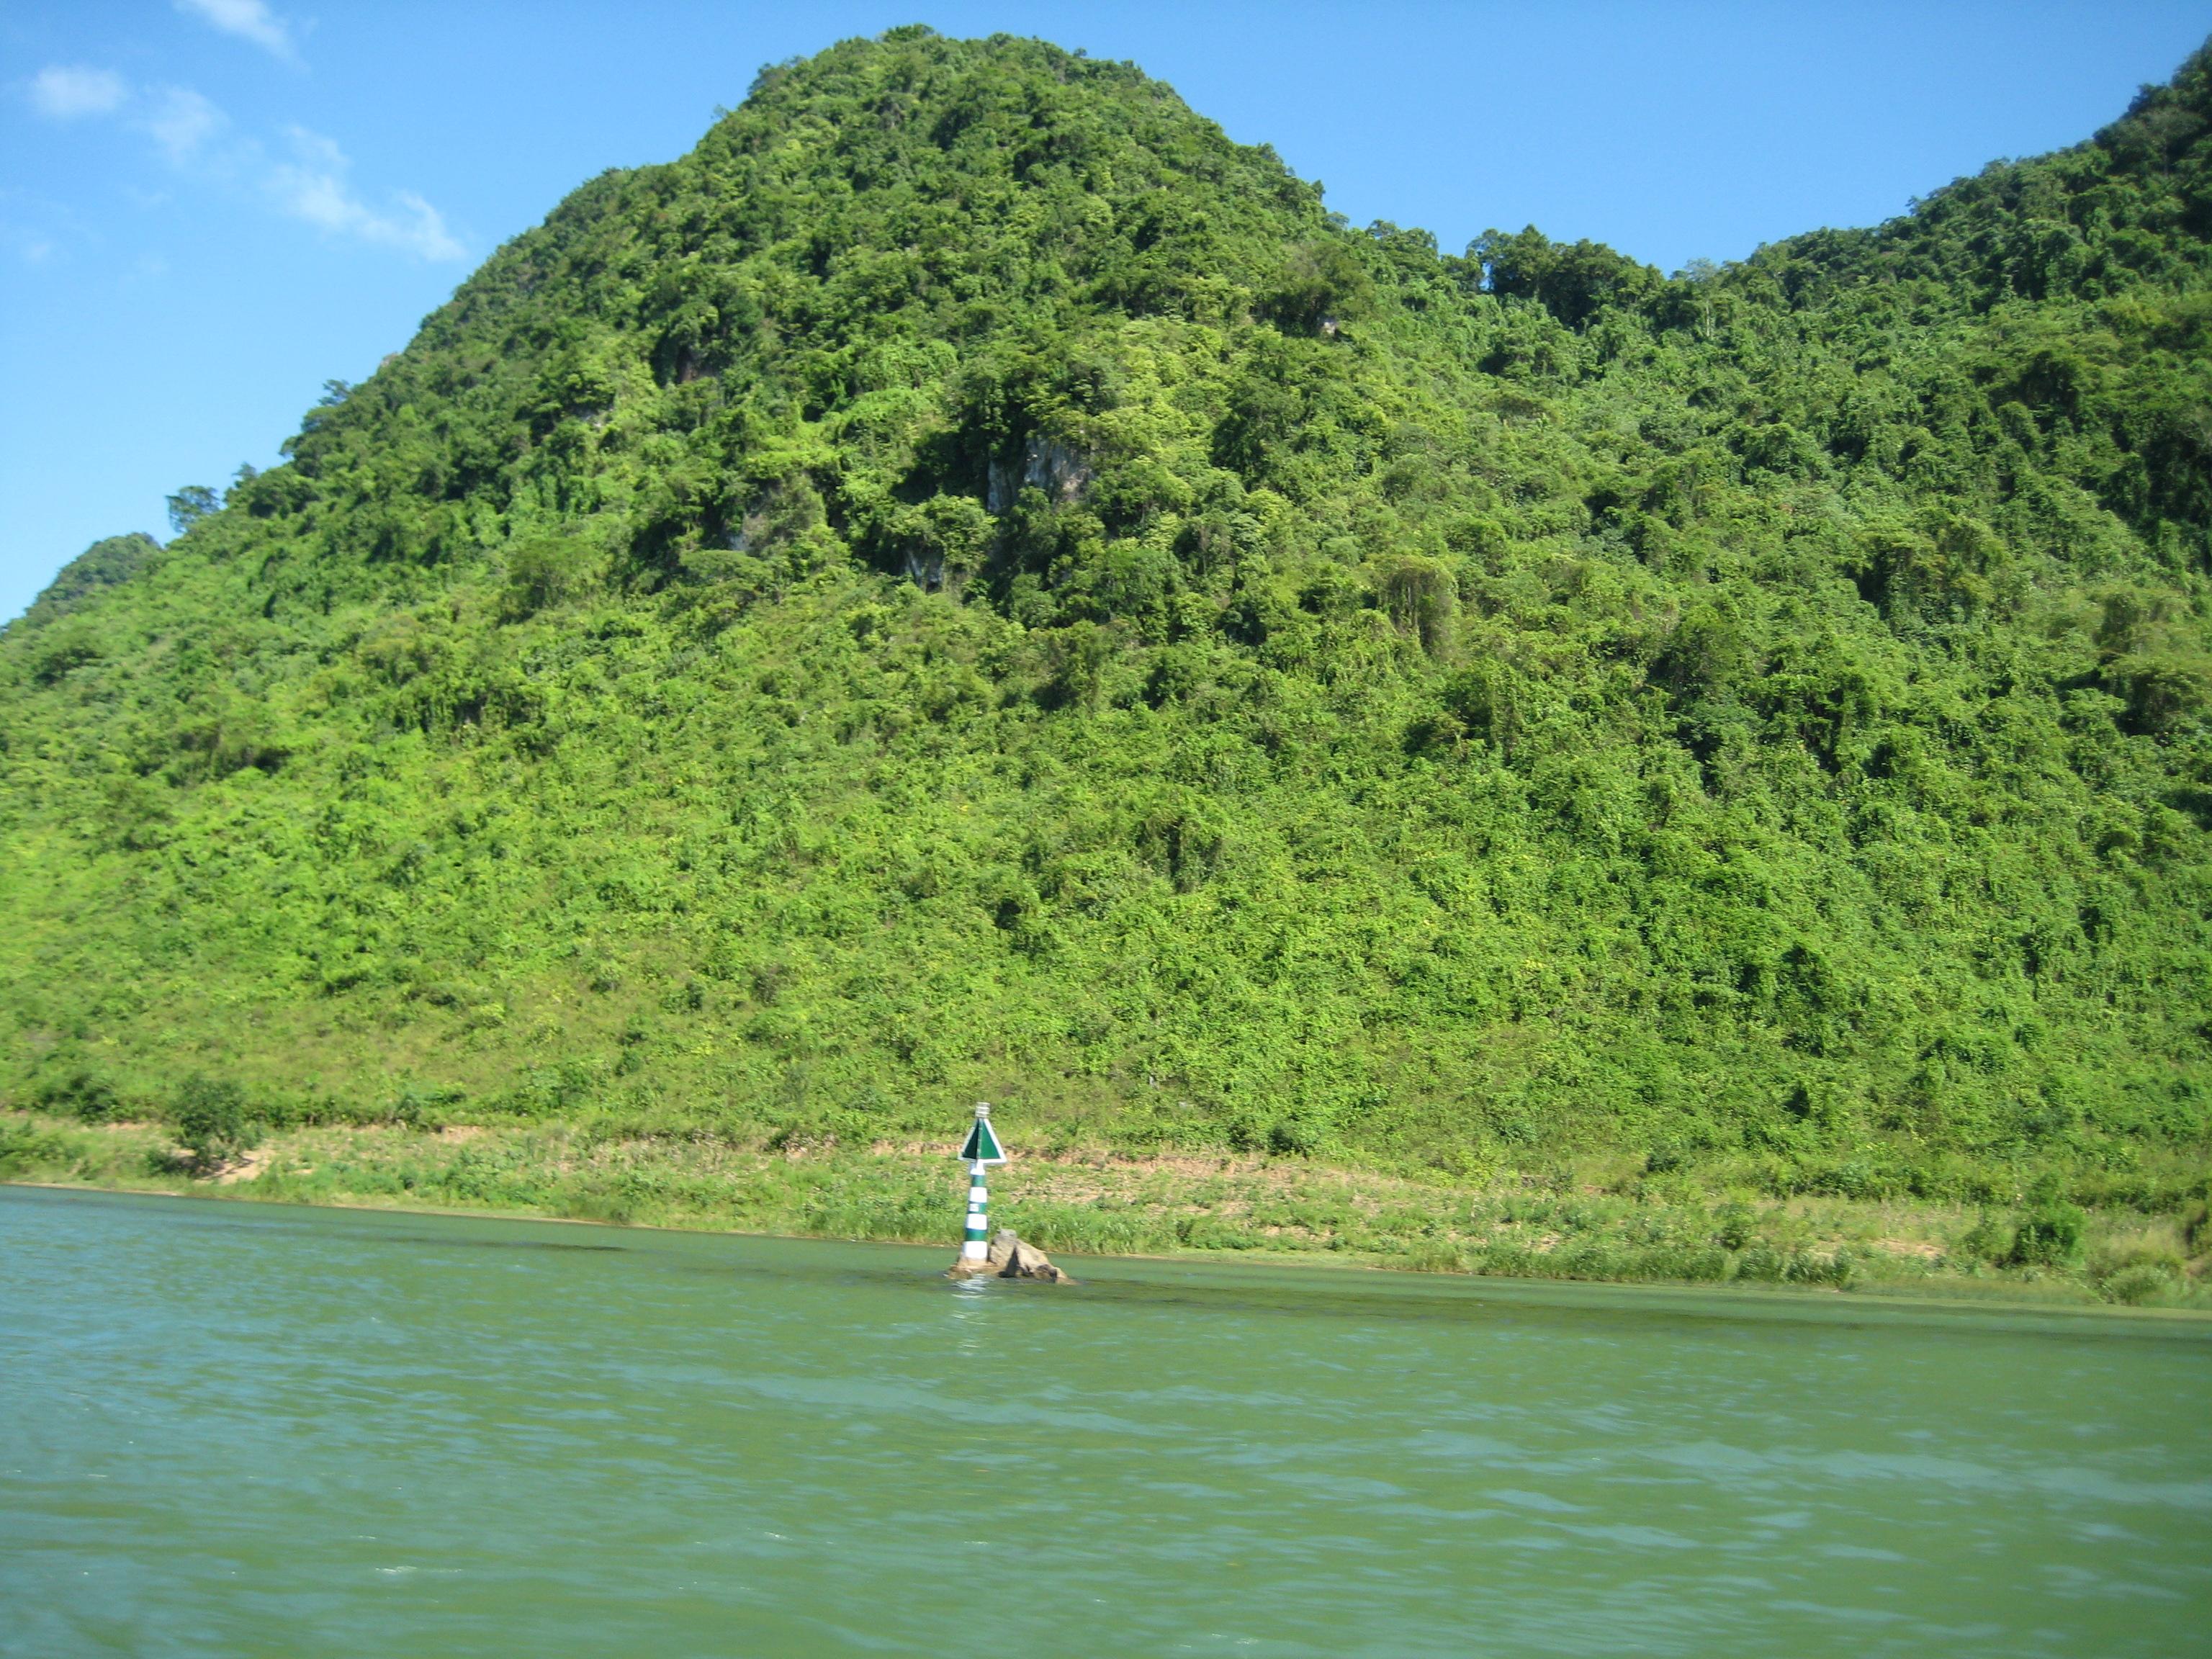 Kham Pha Phong Nha ke Bang Phong Nha-kẻ Bàng National